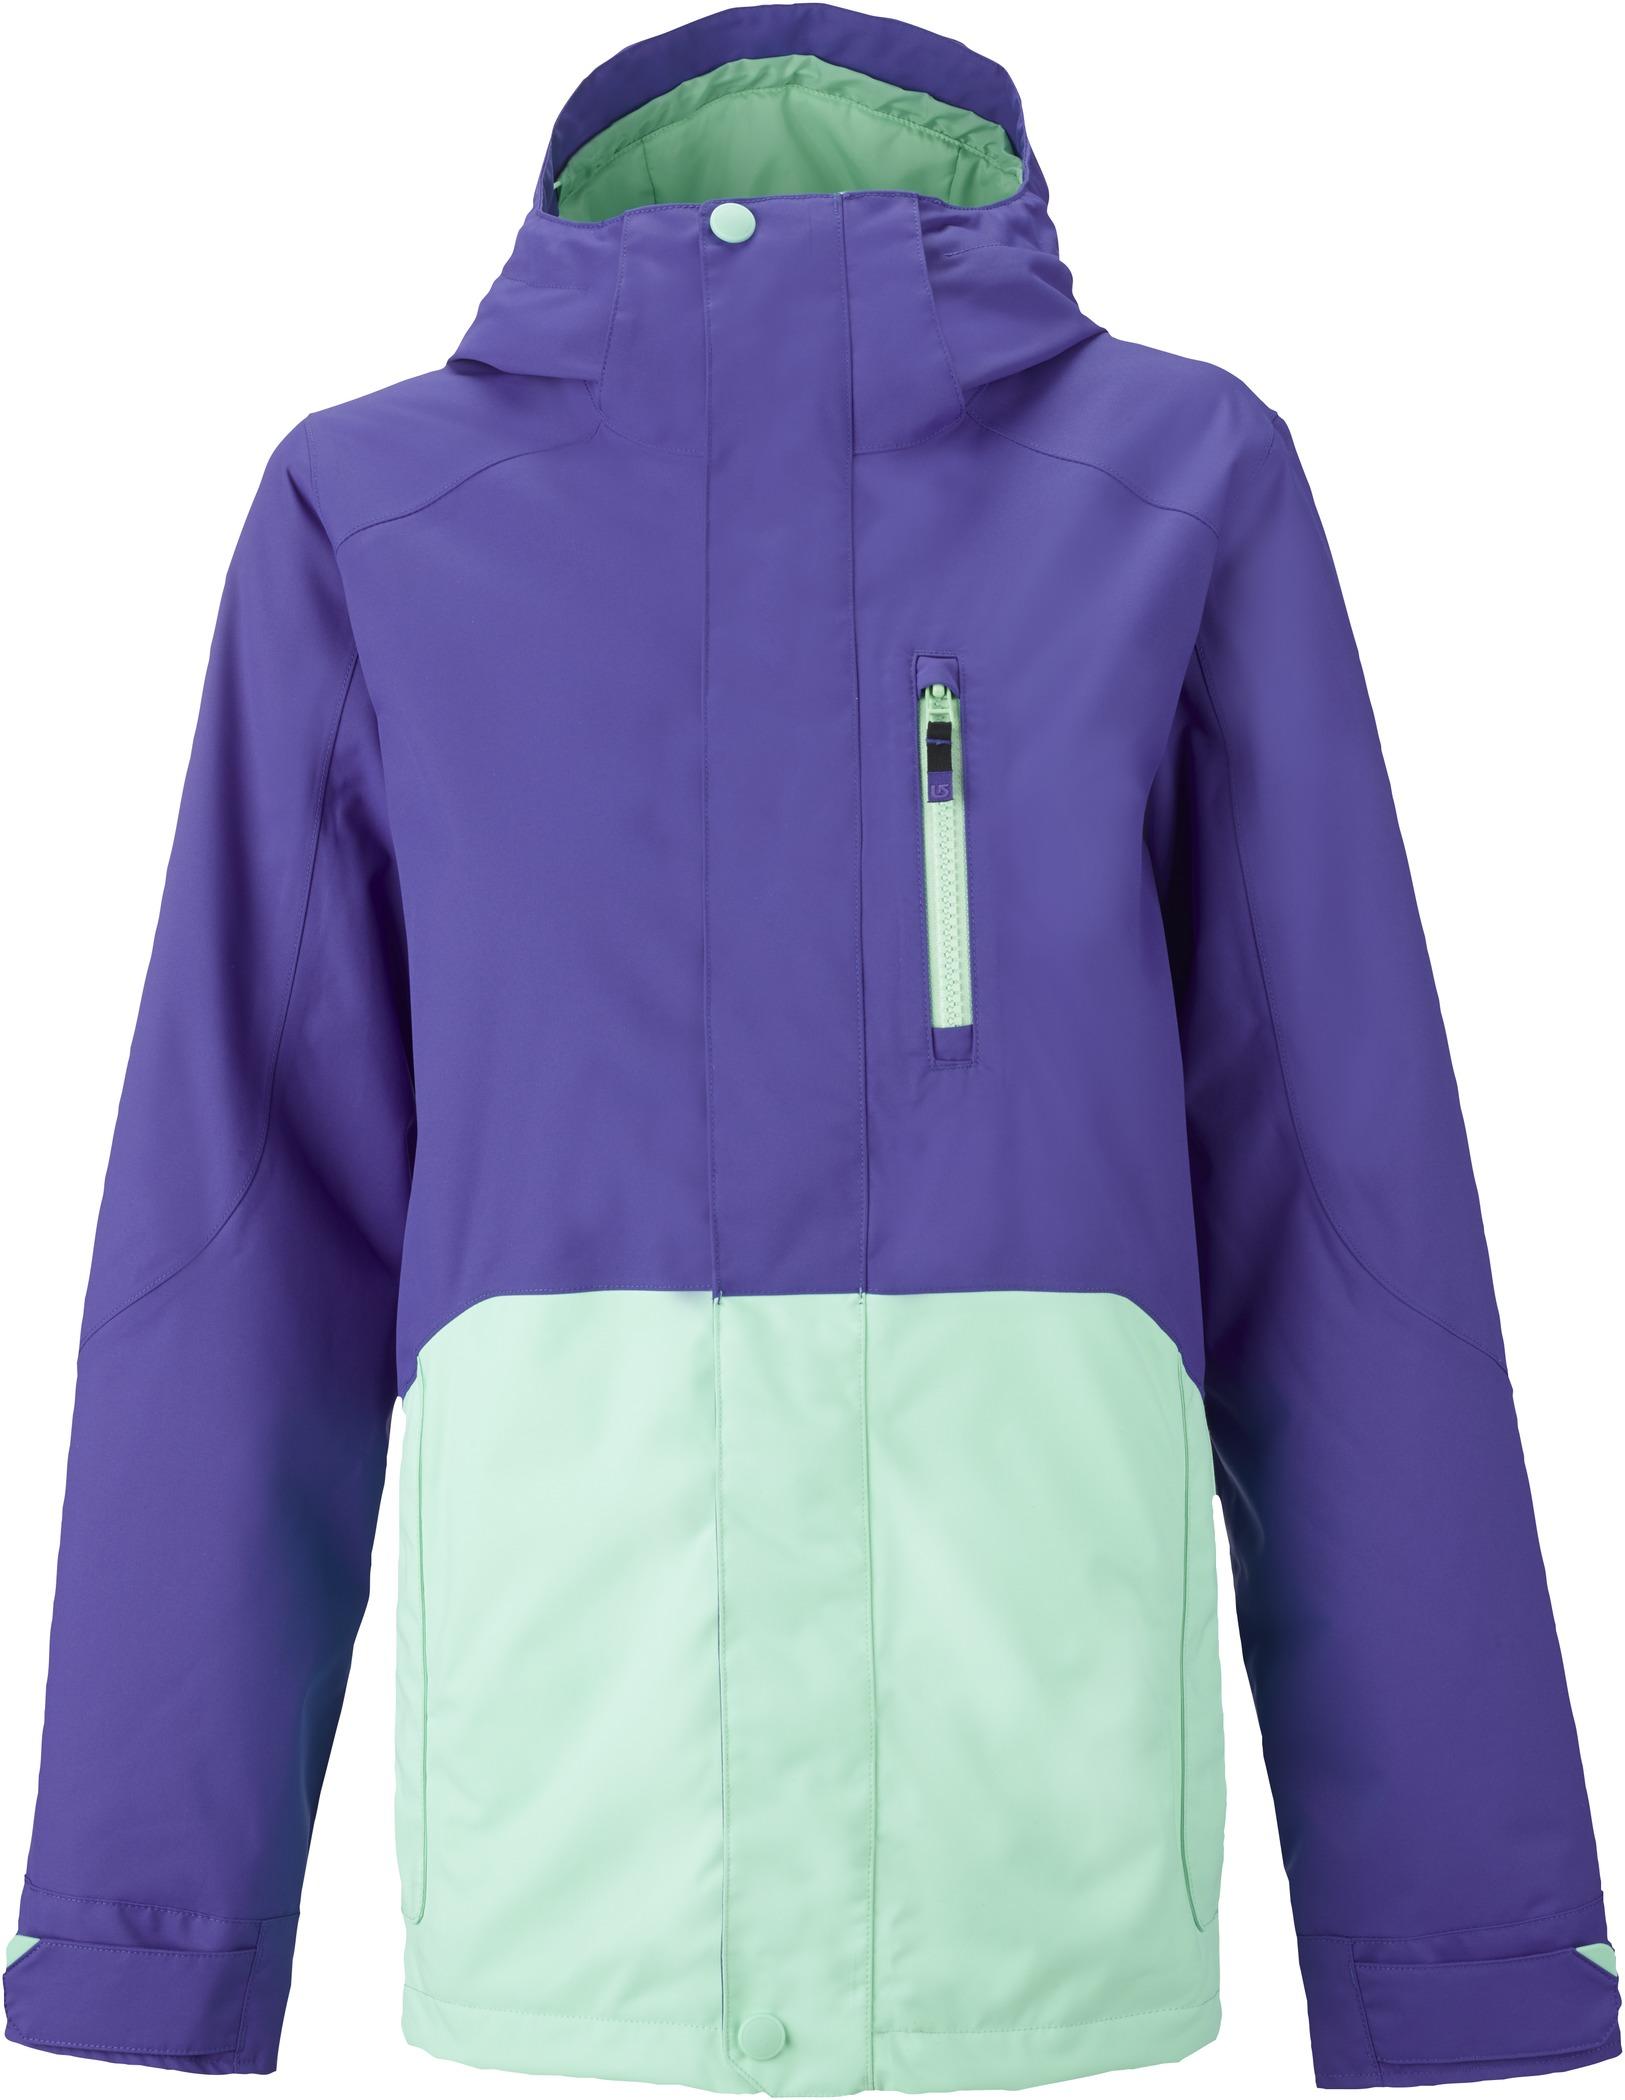 Kurtka Damska Burton Horizon Jacket (Sorcerer/Jadeite)